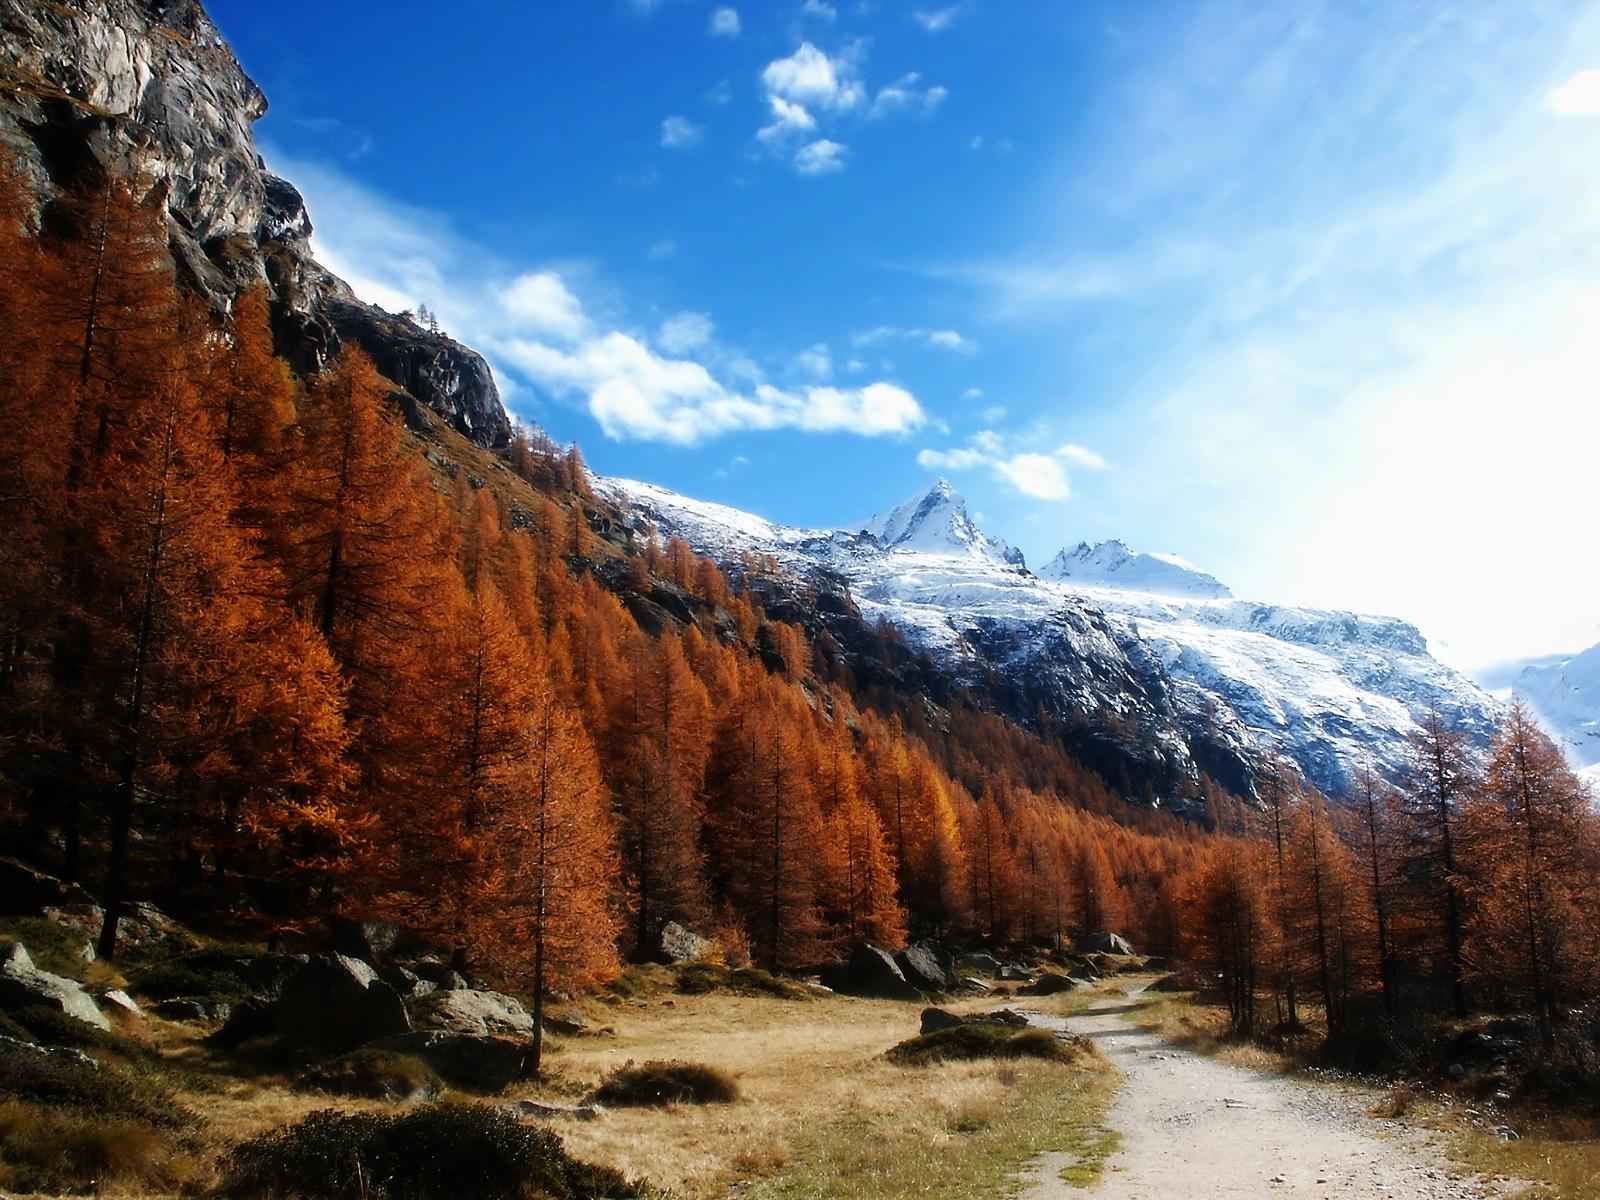 Gran Paradiso Wallpaper Landscape Nature Wallpapers in jpg format